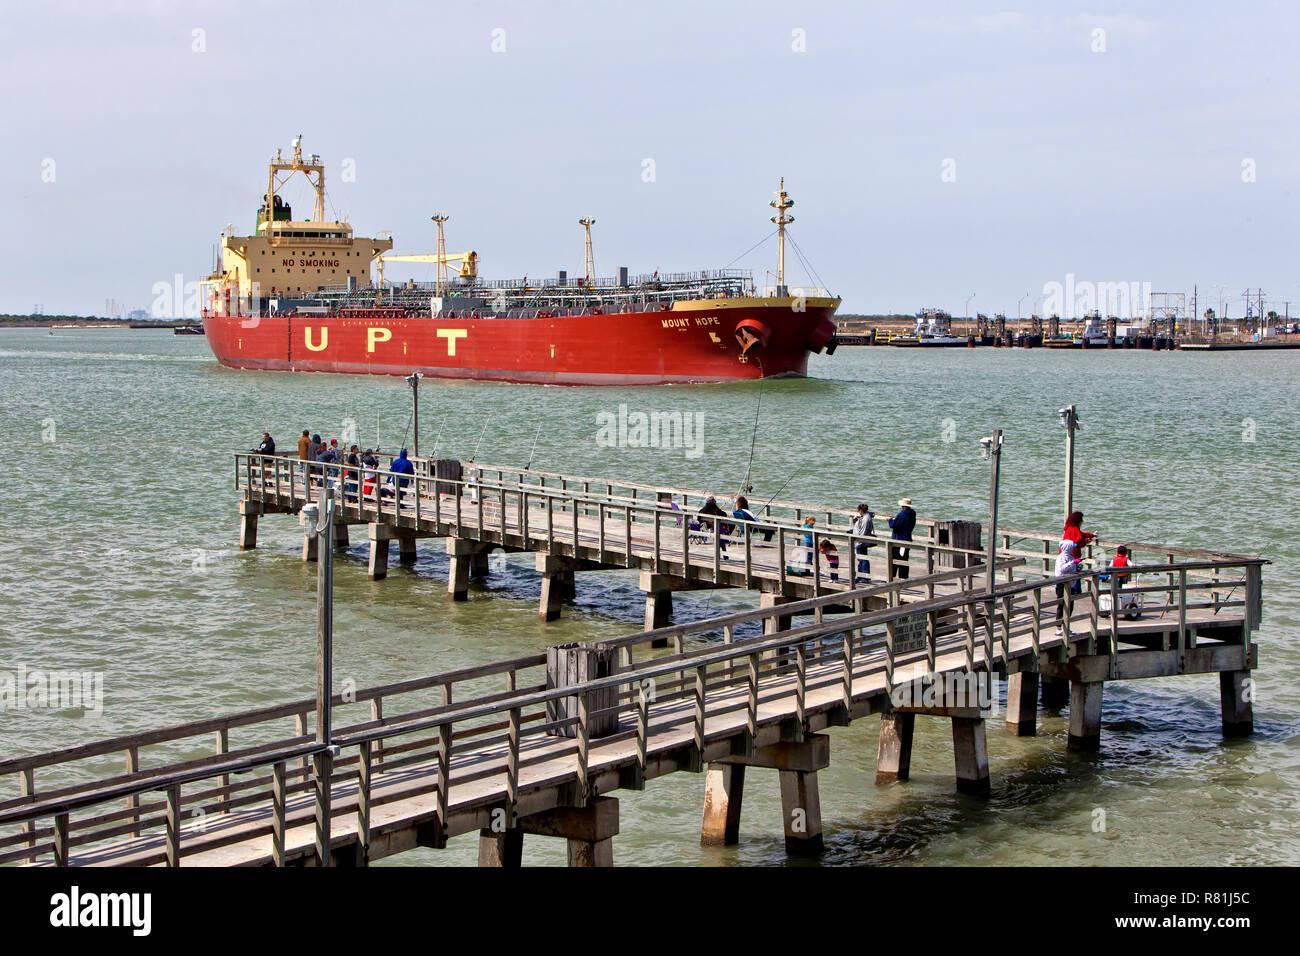 Liquid Bulk Tanker 'Mount Hope', UPT maneuvering Corpus Christi Shipping Channel, passing Roberts Point Park, Port Aransas. - Stock Image